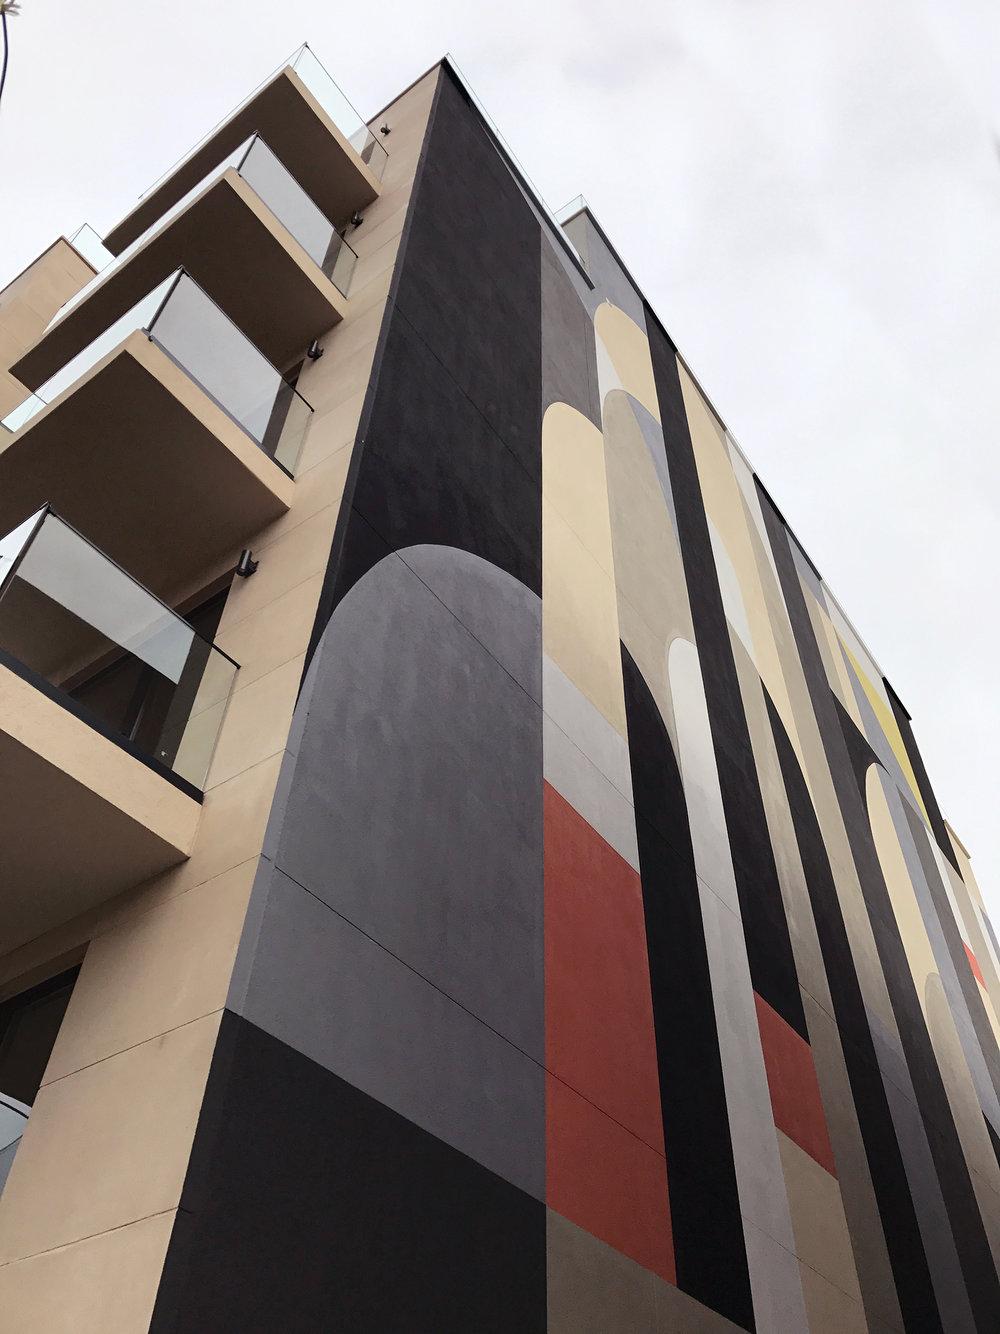 graffiti-house-exterior-mural.jpg